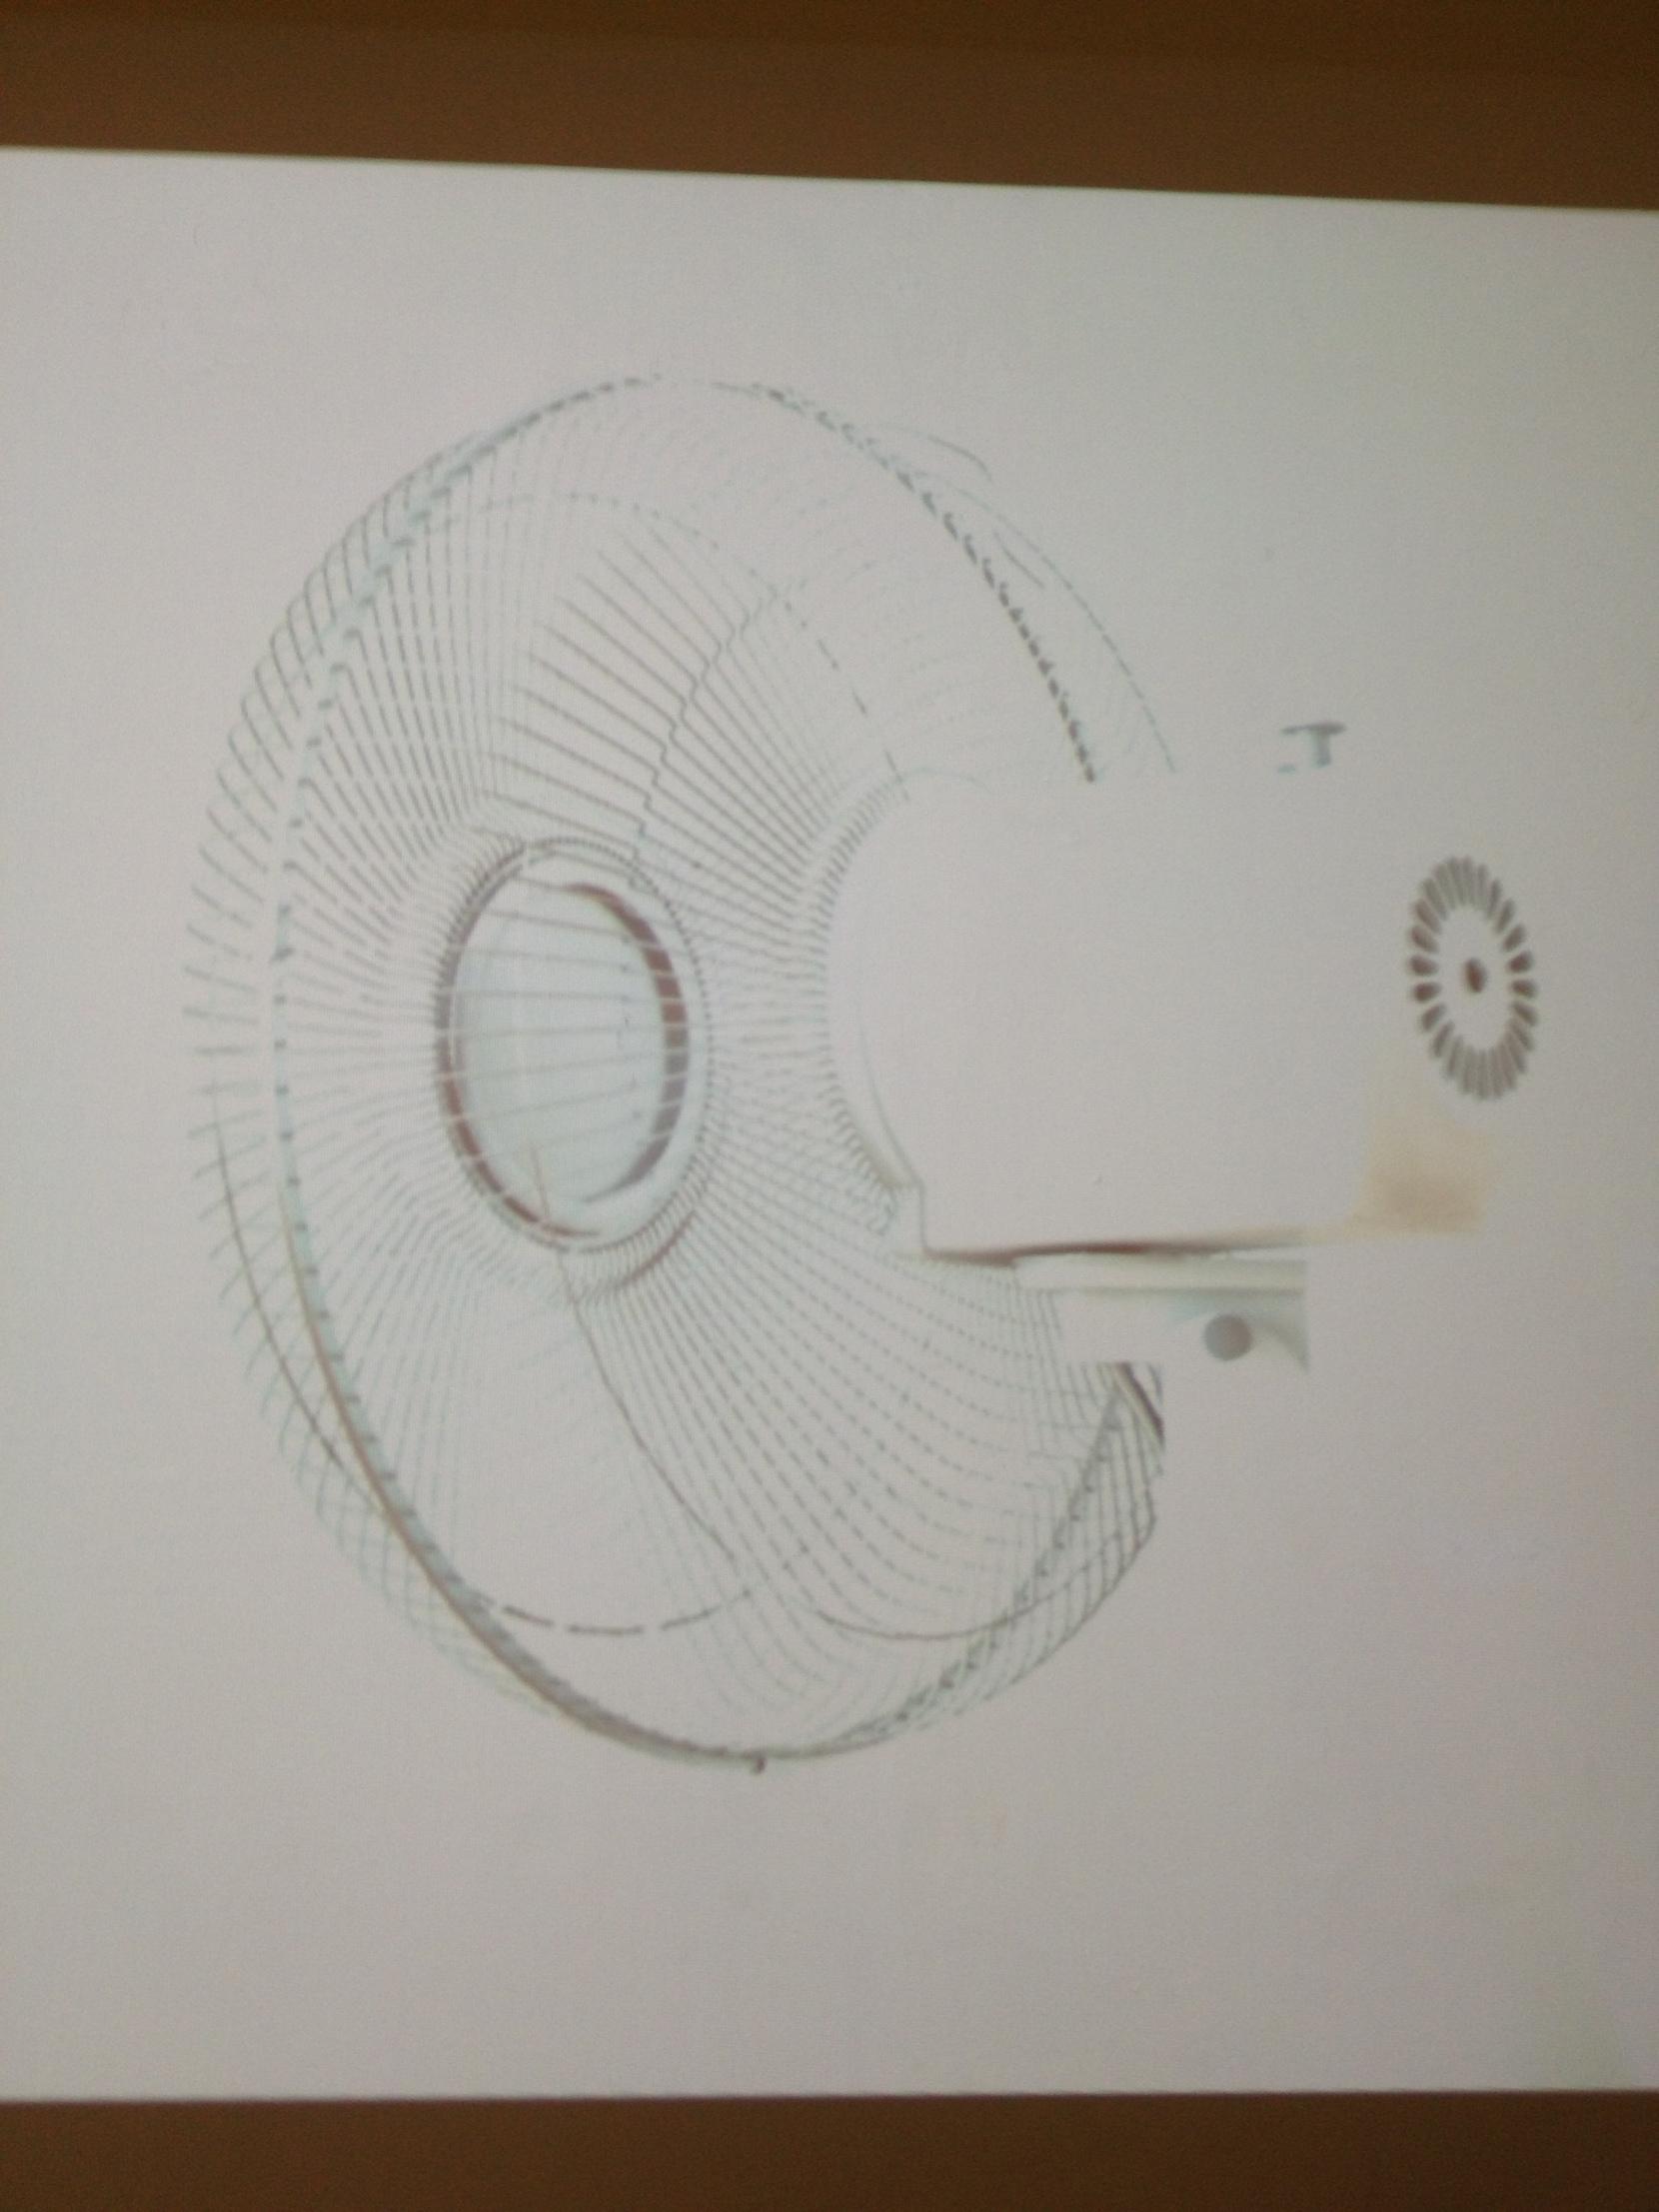 Kerem Ozan - Pervanesiz Fan